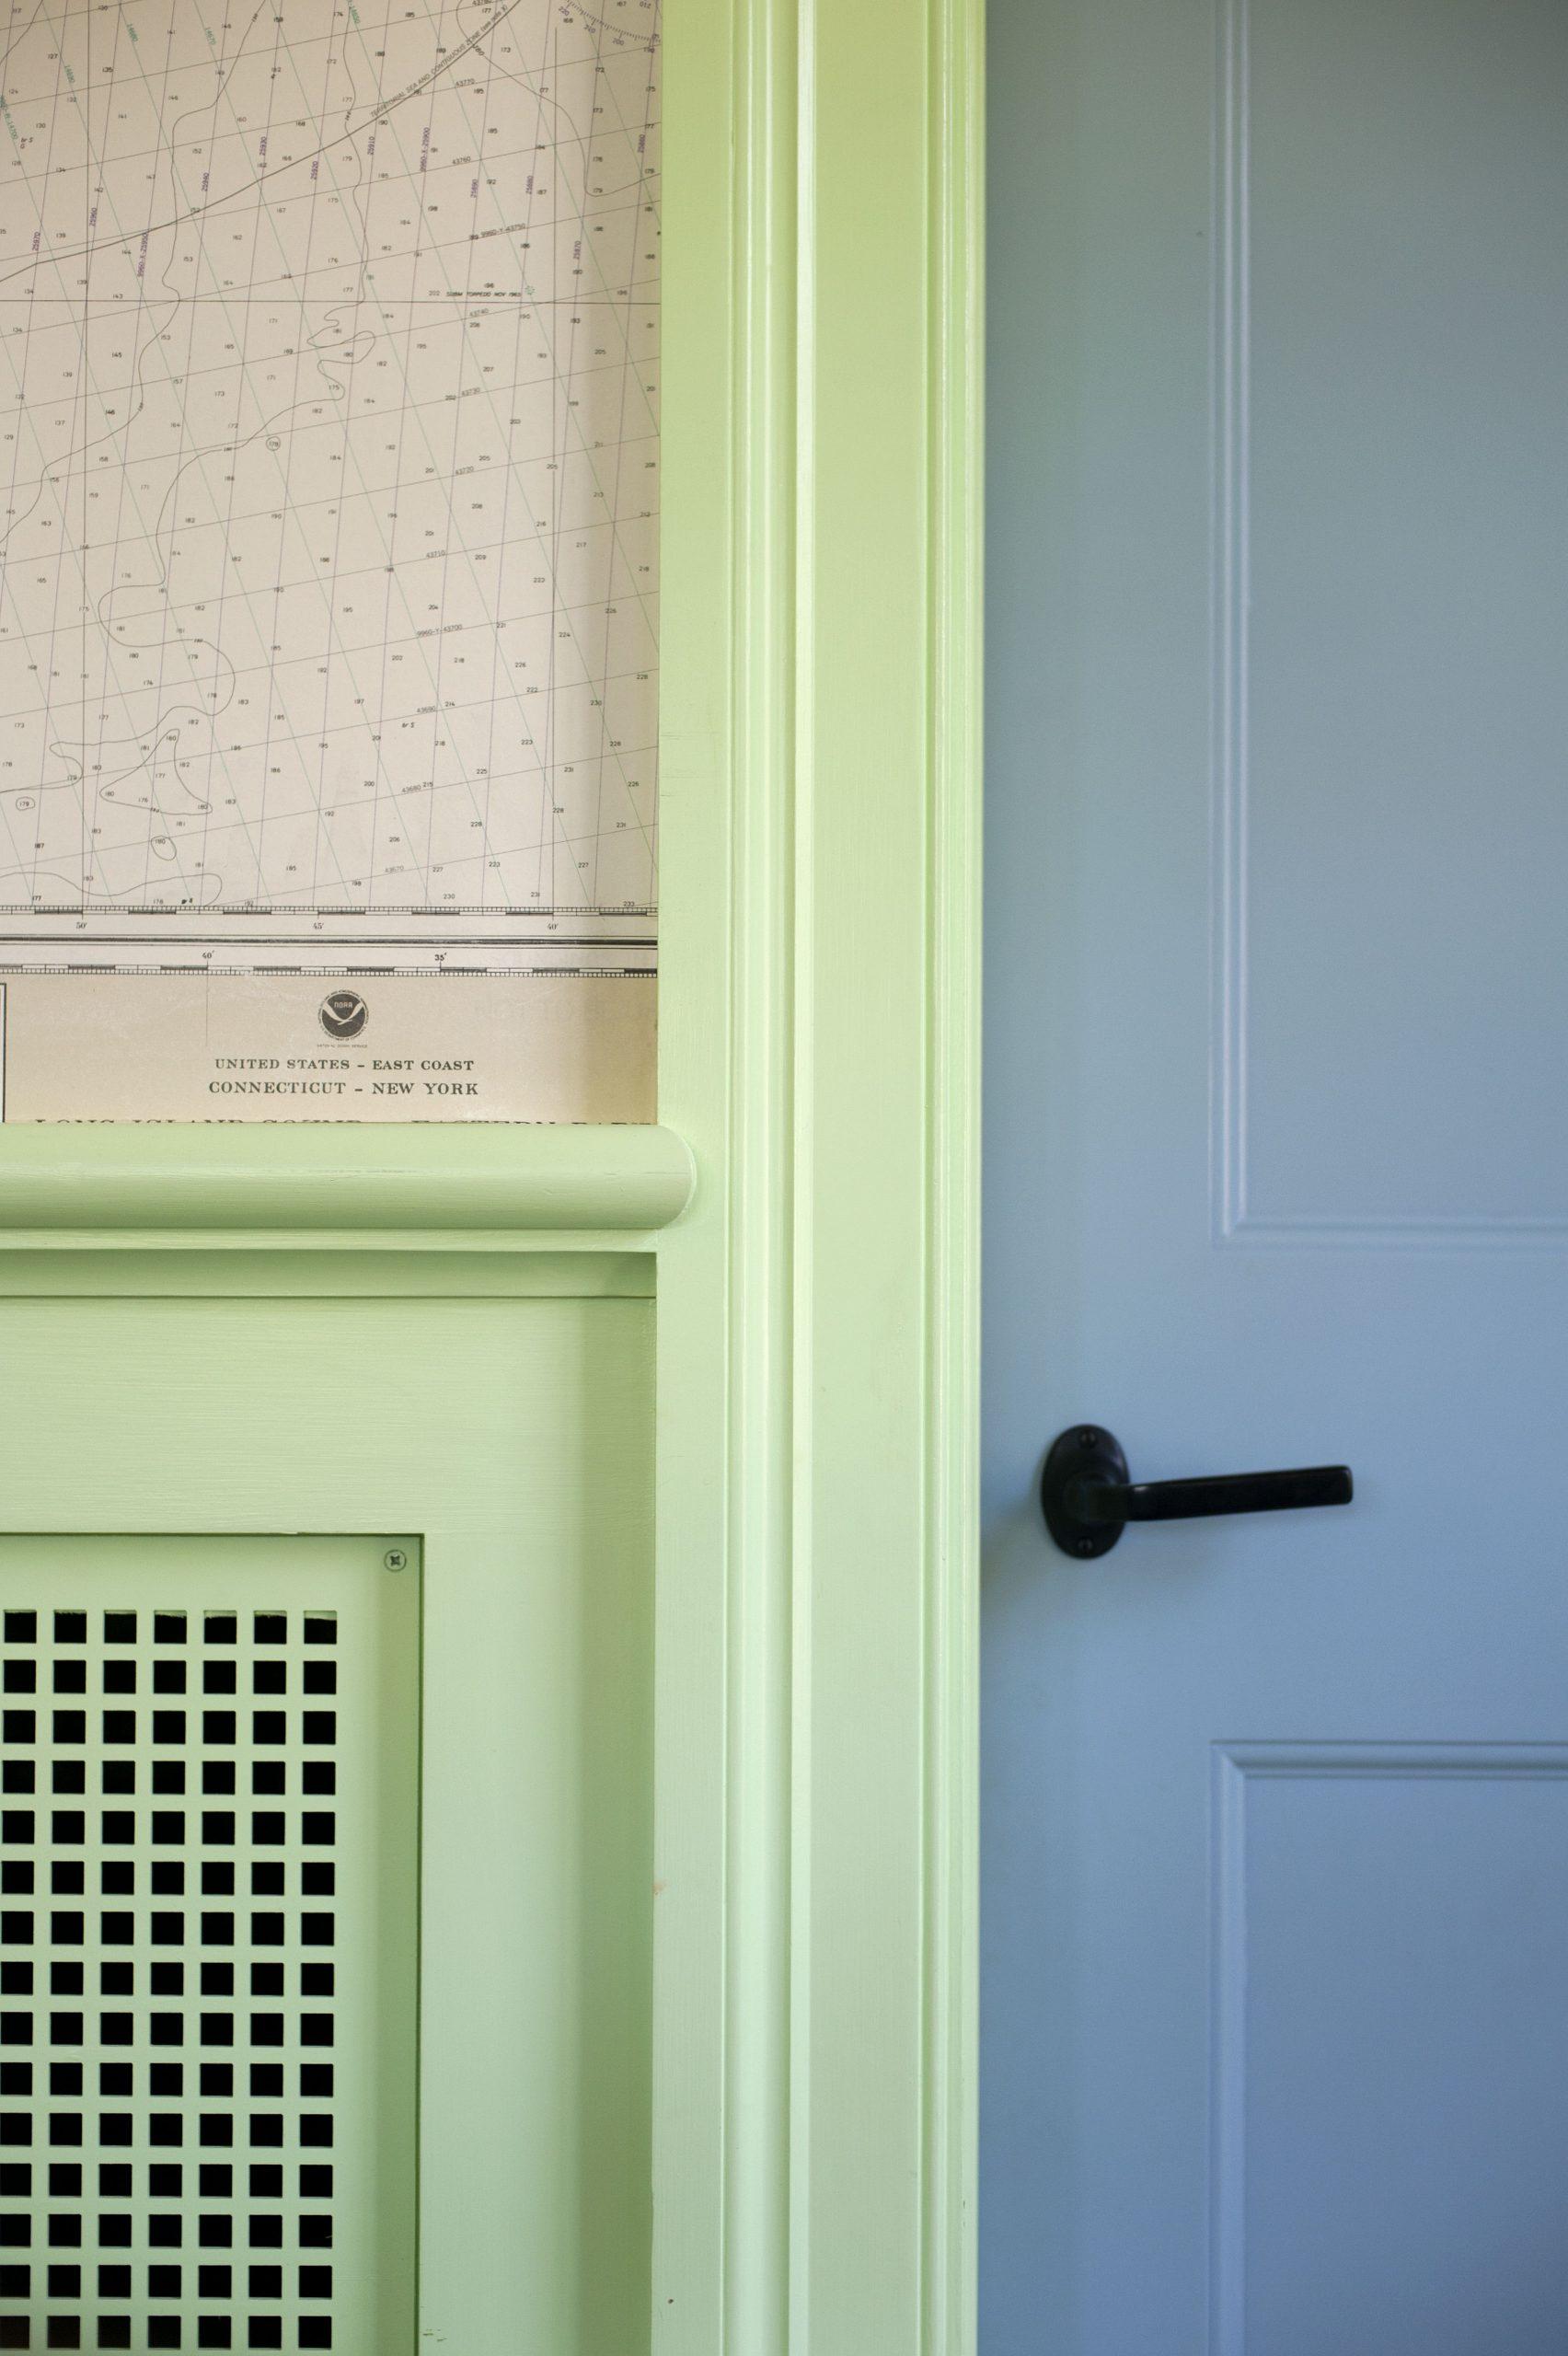 Heller_Badilla-Painters_77-Gin-Lane-Southampton-9-19-13_9647